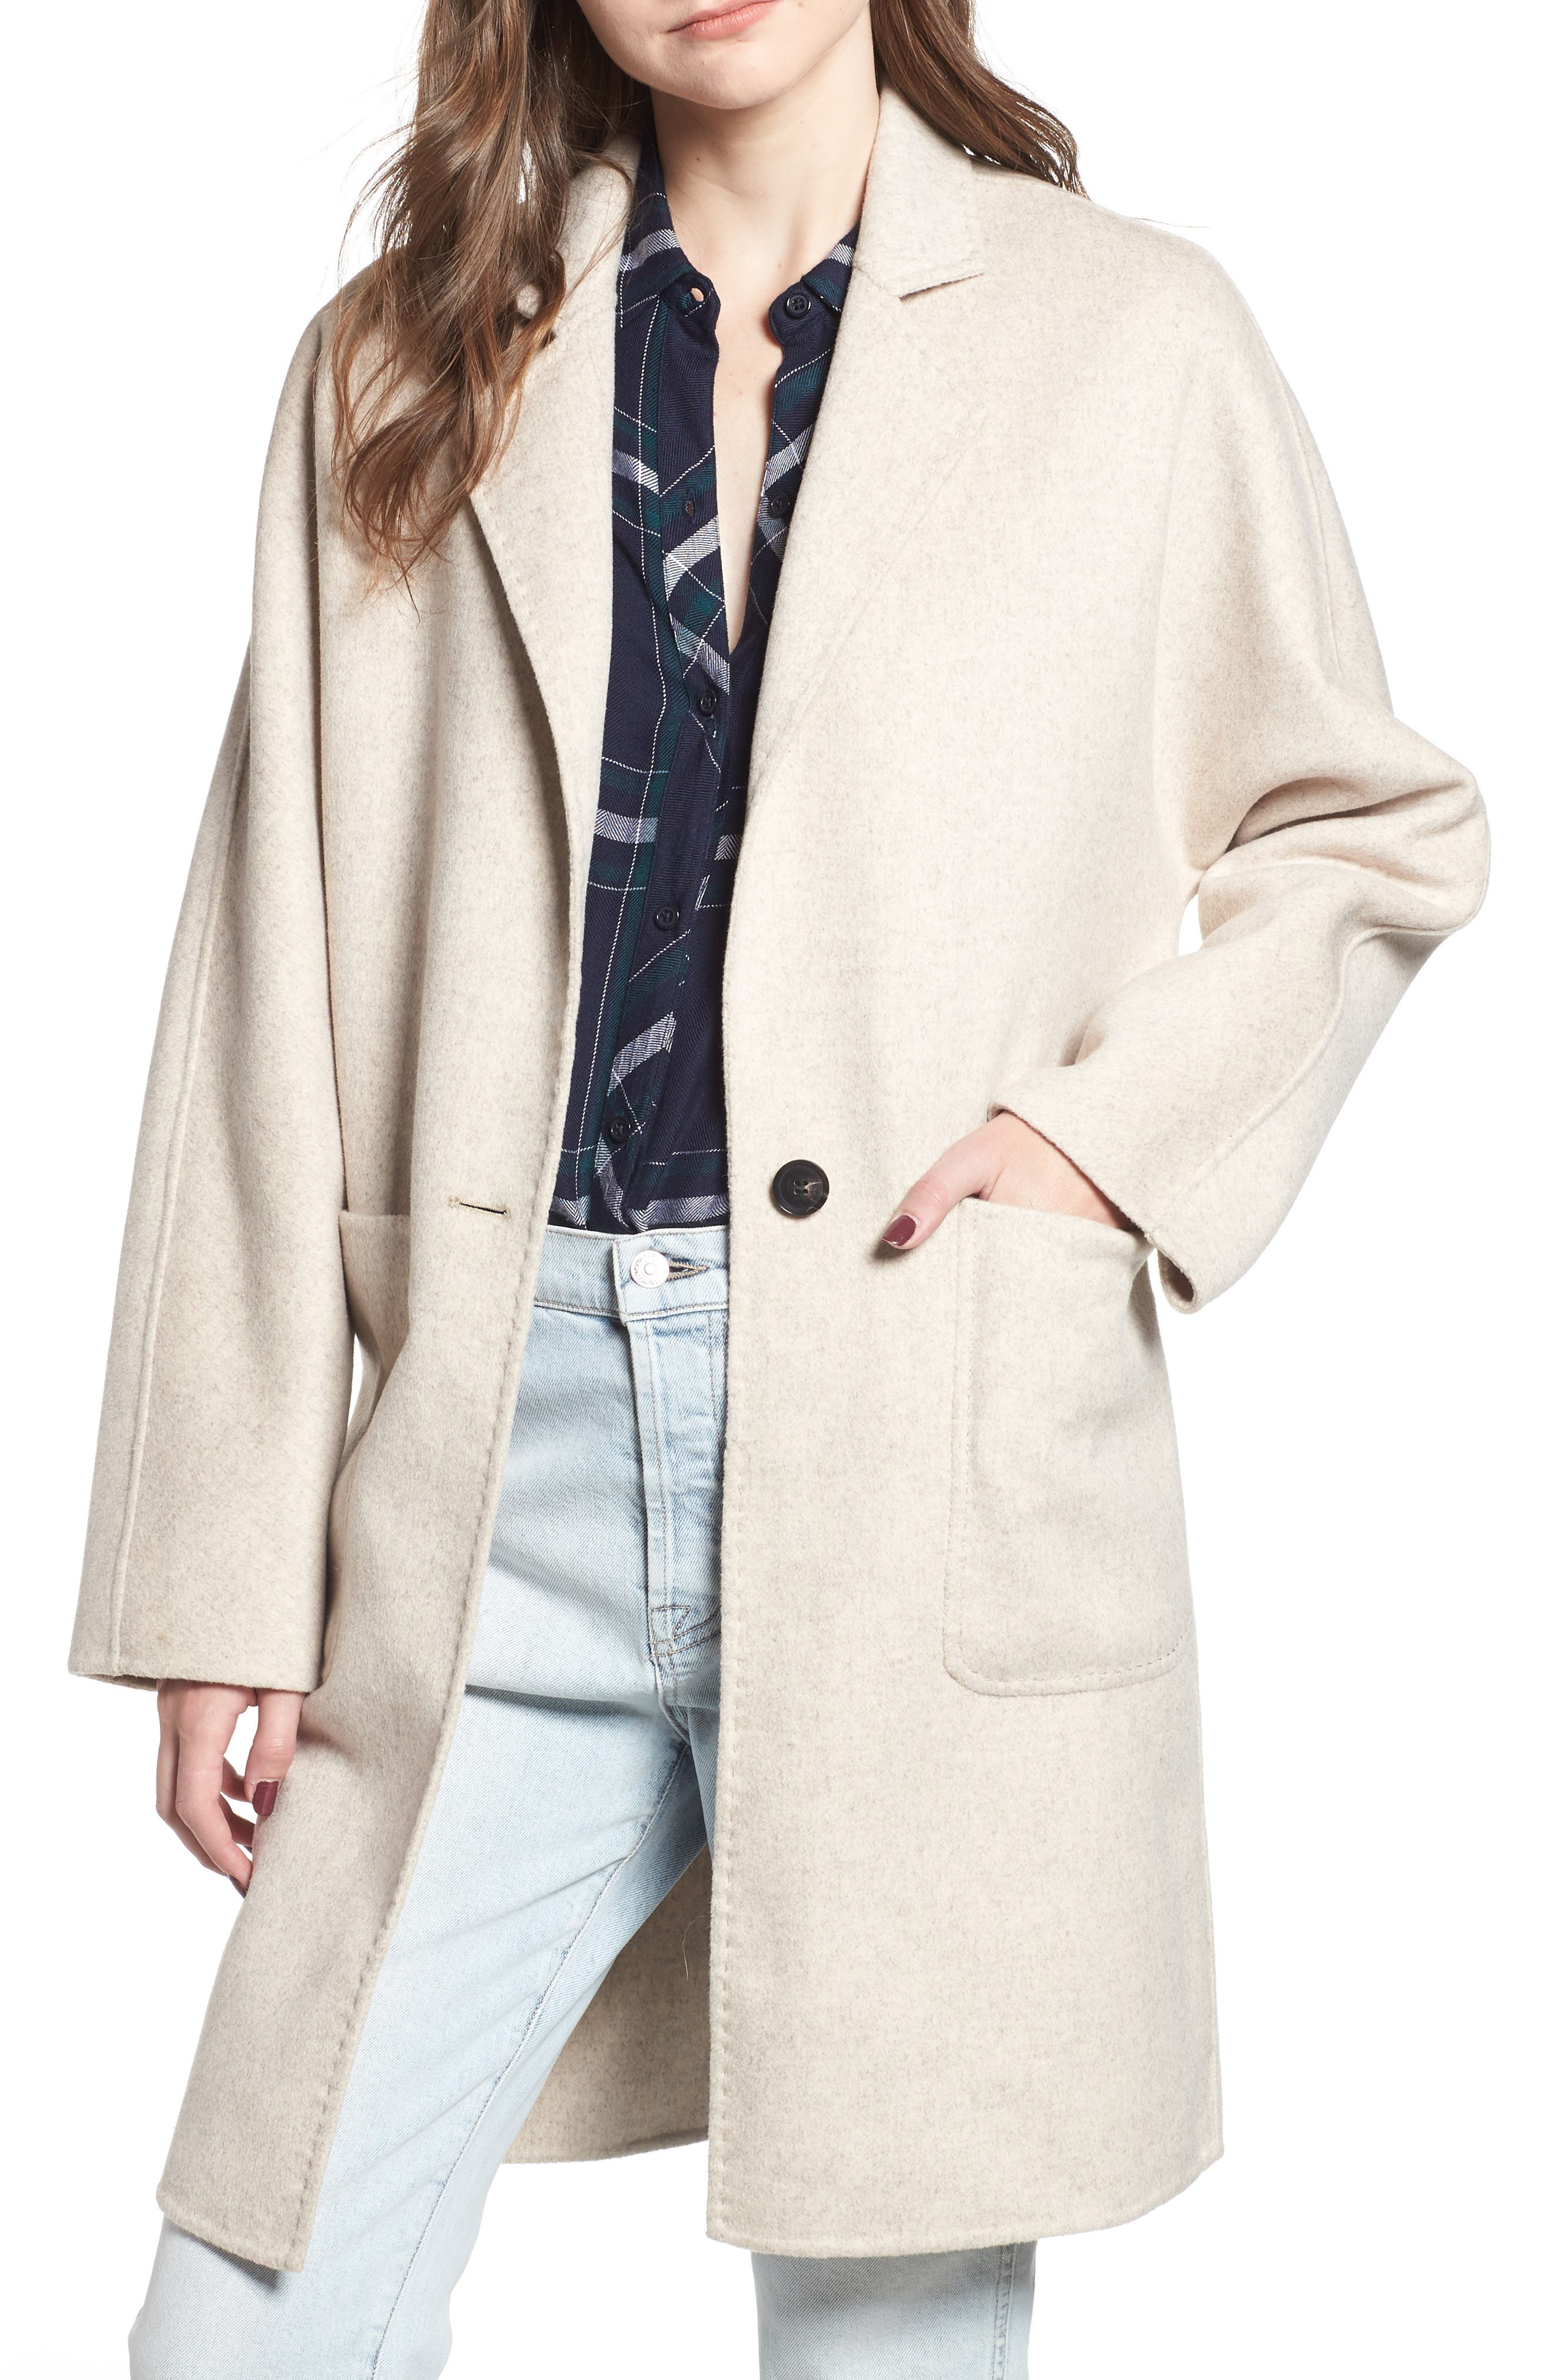 Everest Wool Blend Coat,                         Main,                         color, 905